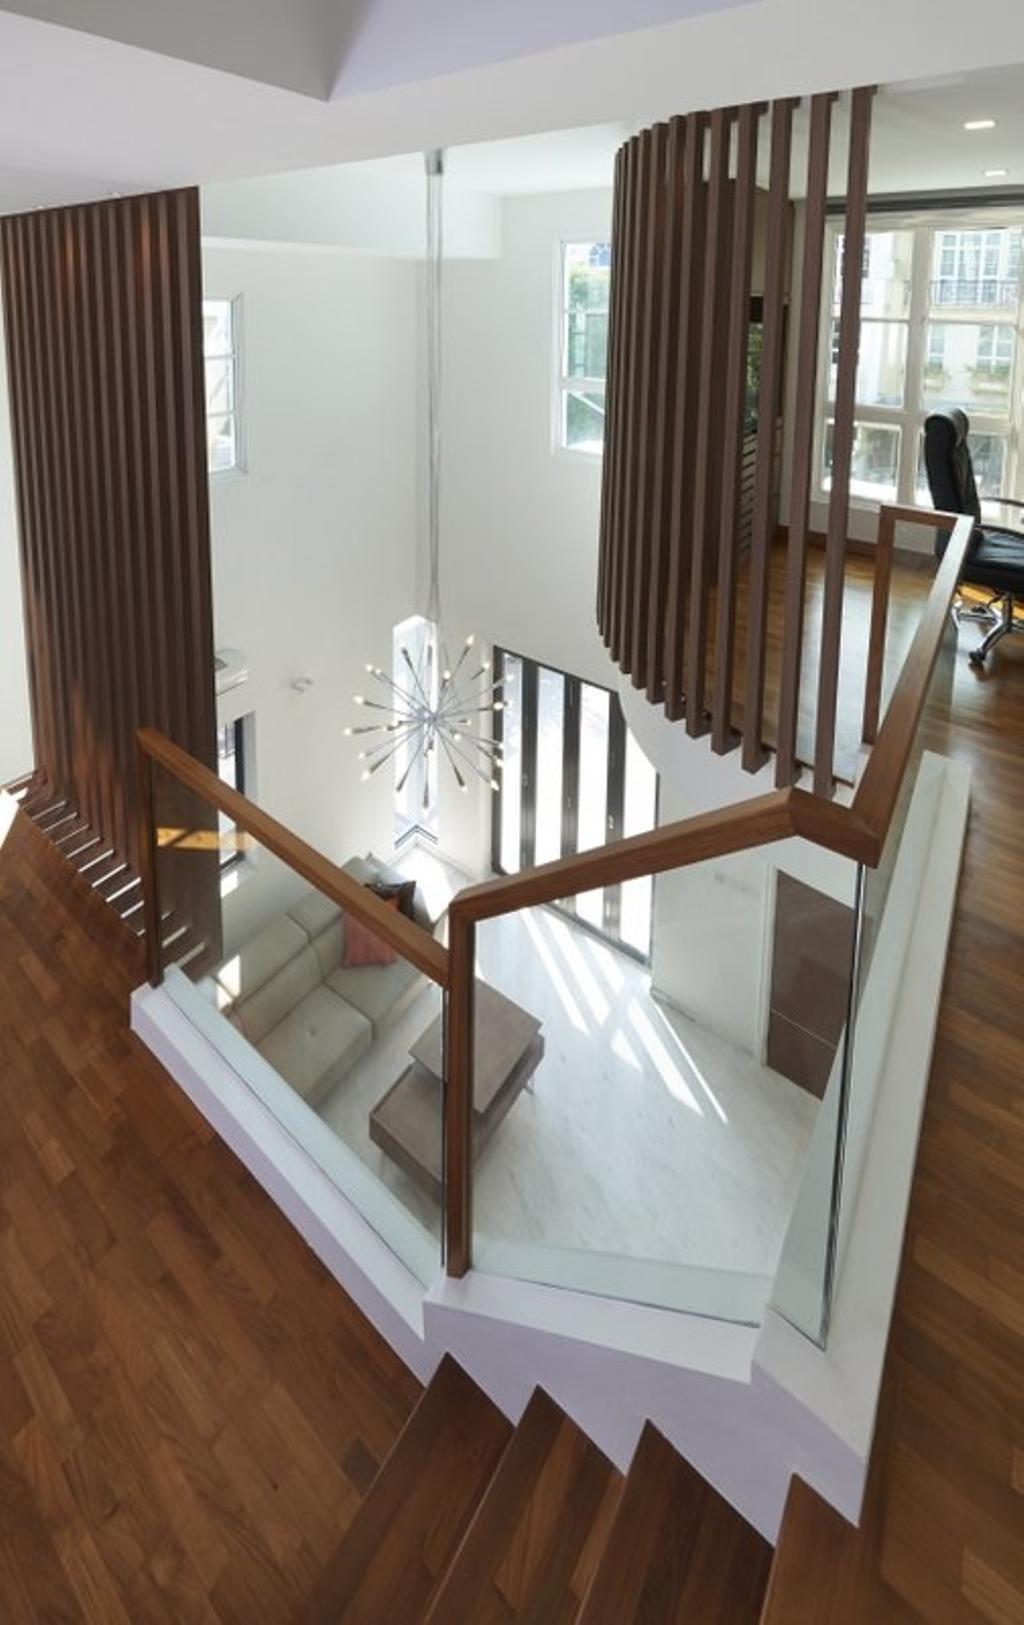 Minimalistic, Landed, Burgundy (Bukit Batok), Interior Designer, Spire Id, Wooden Flooring, Parquet, Wooden Beams, Wooden Partition, Partition, Staircase, Mirror, Banister, Handrail